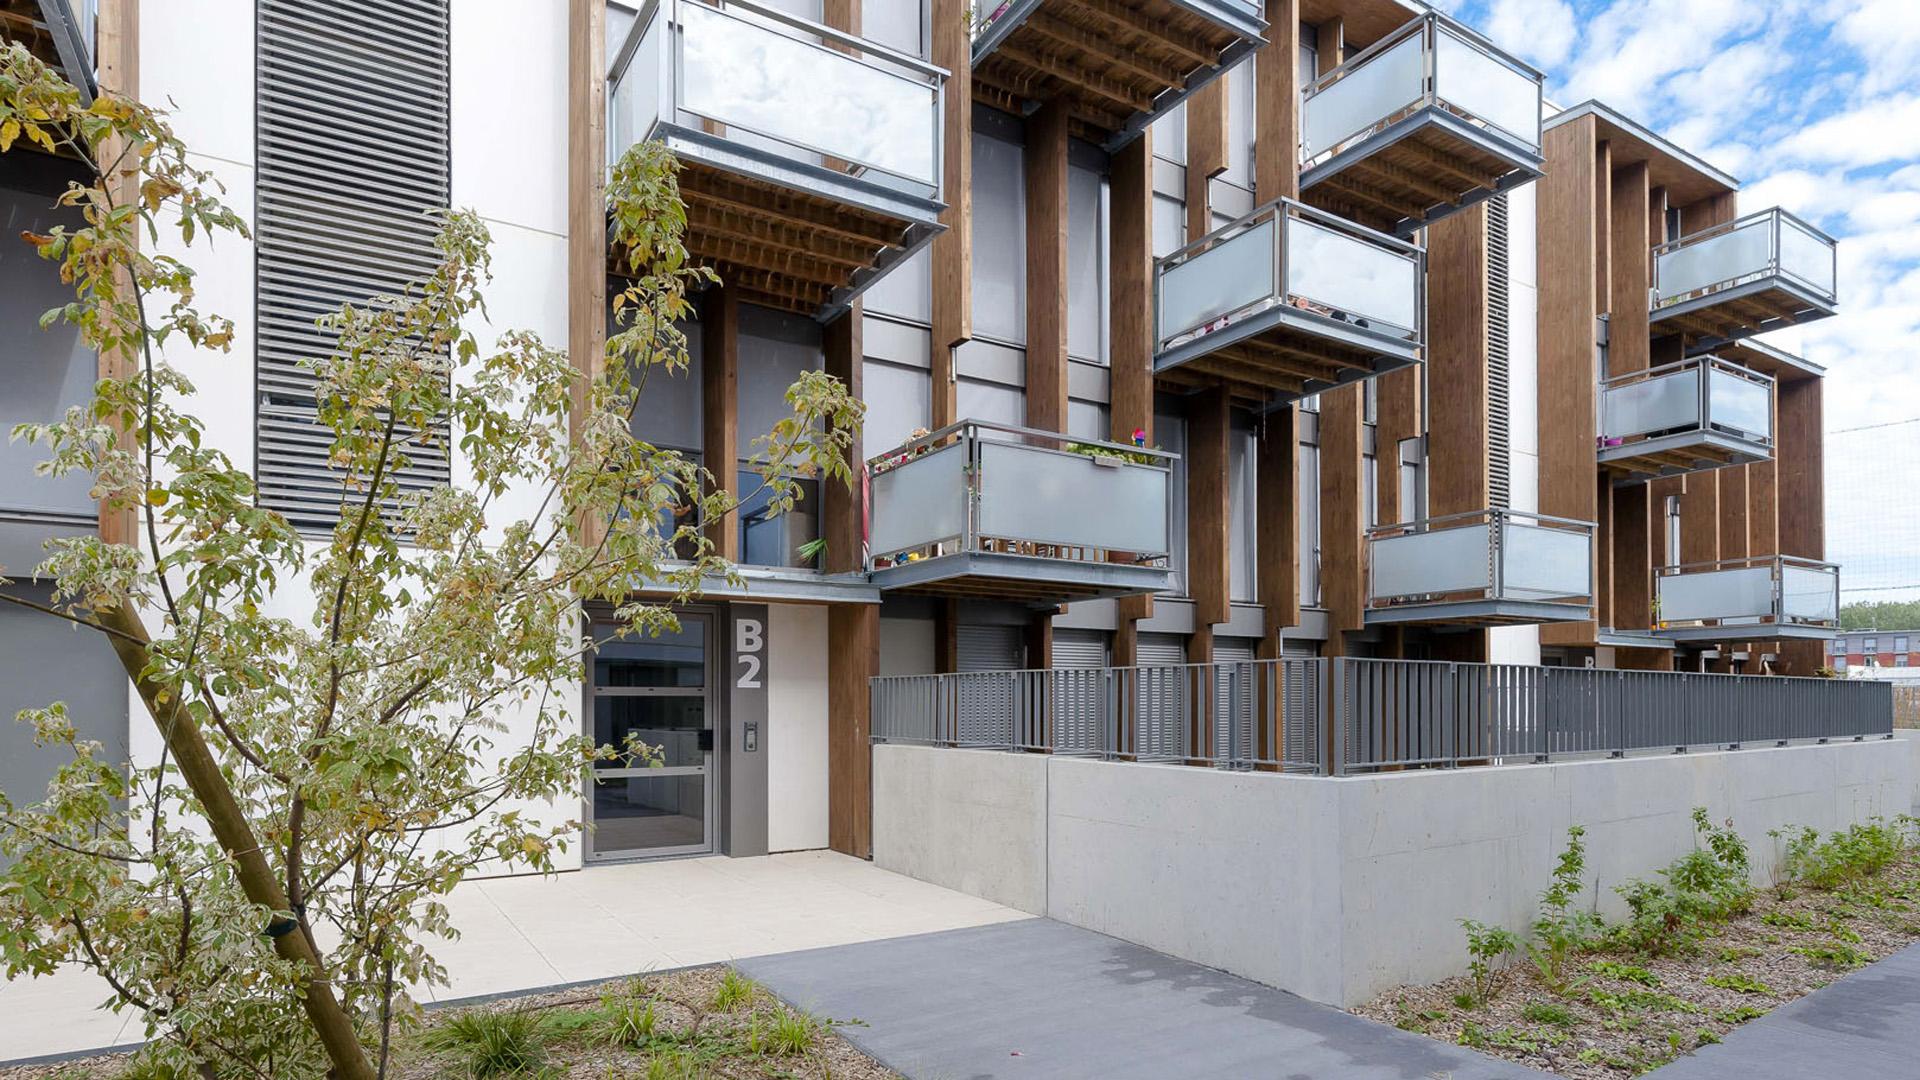 Seuil-architecture-Canavera-ICF-photo-S.Brugidou-04